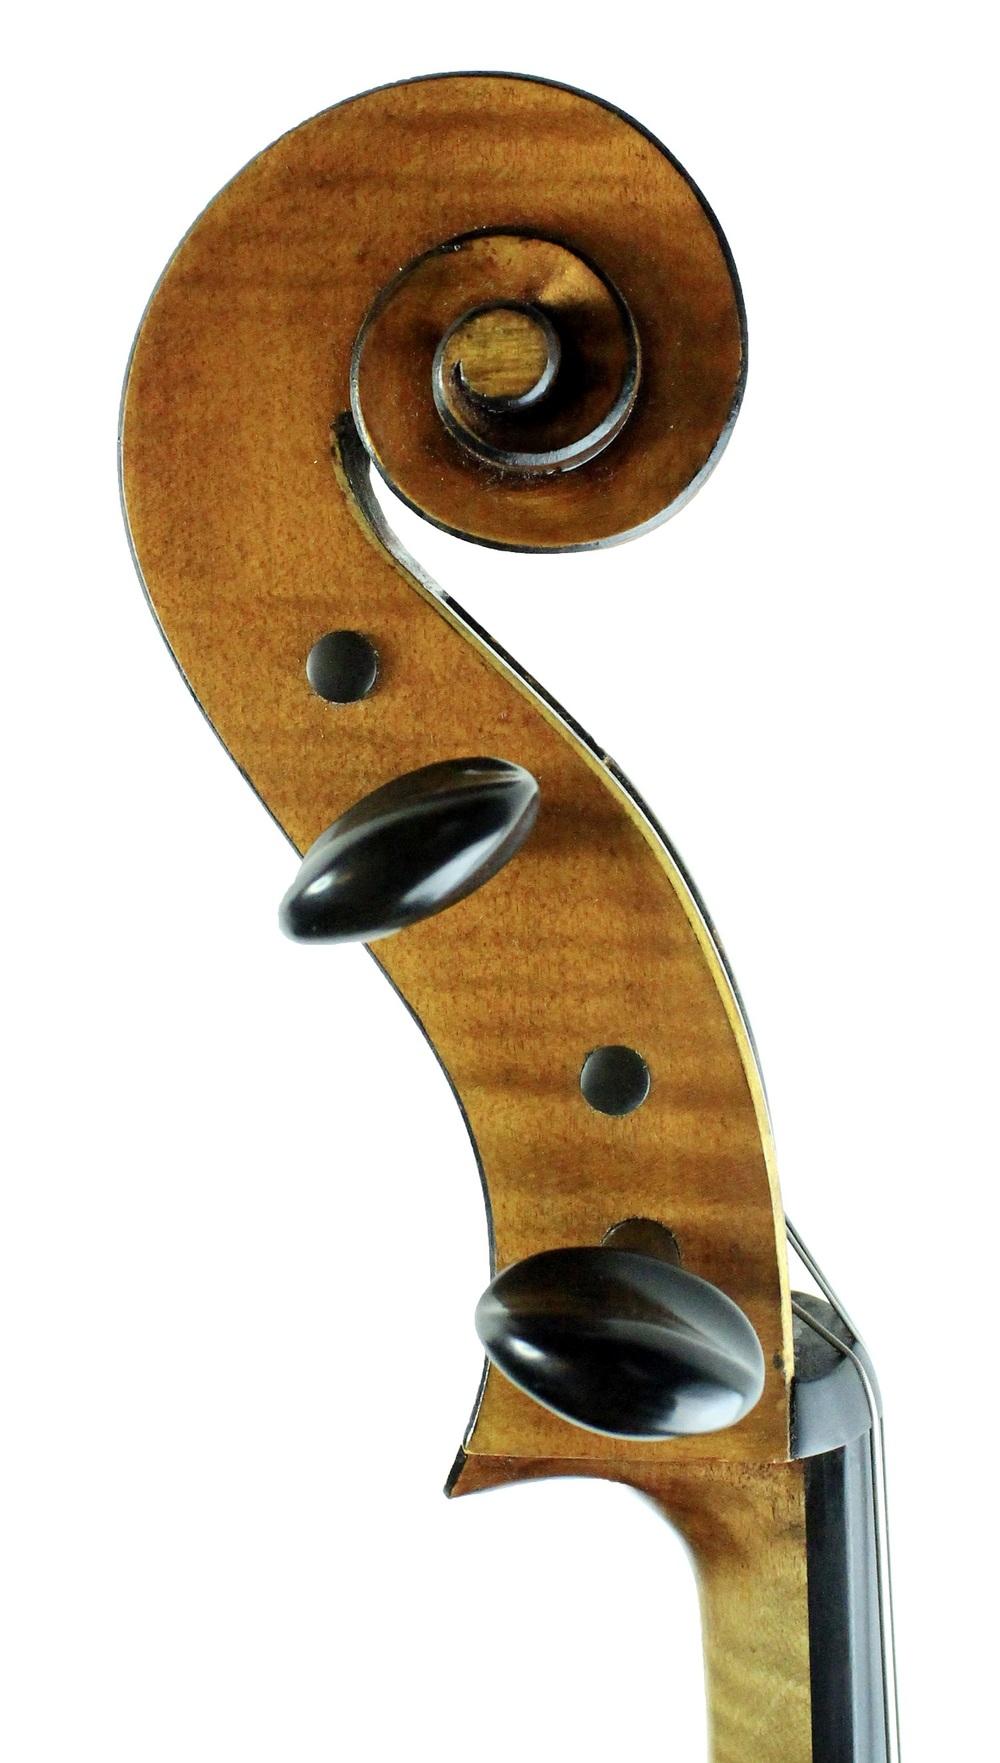 Ines (cello), Itzel Avila, 2011